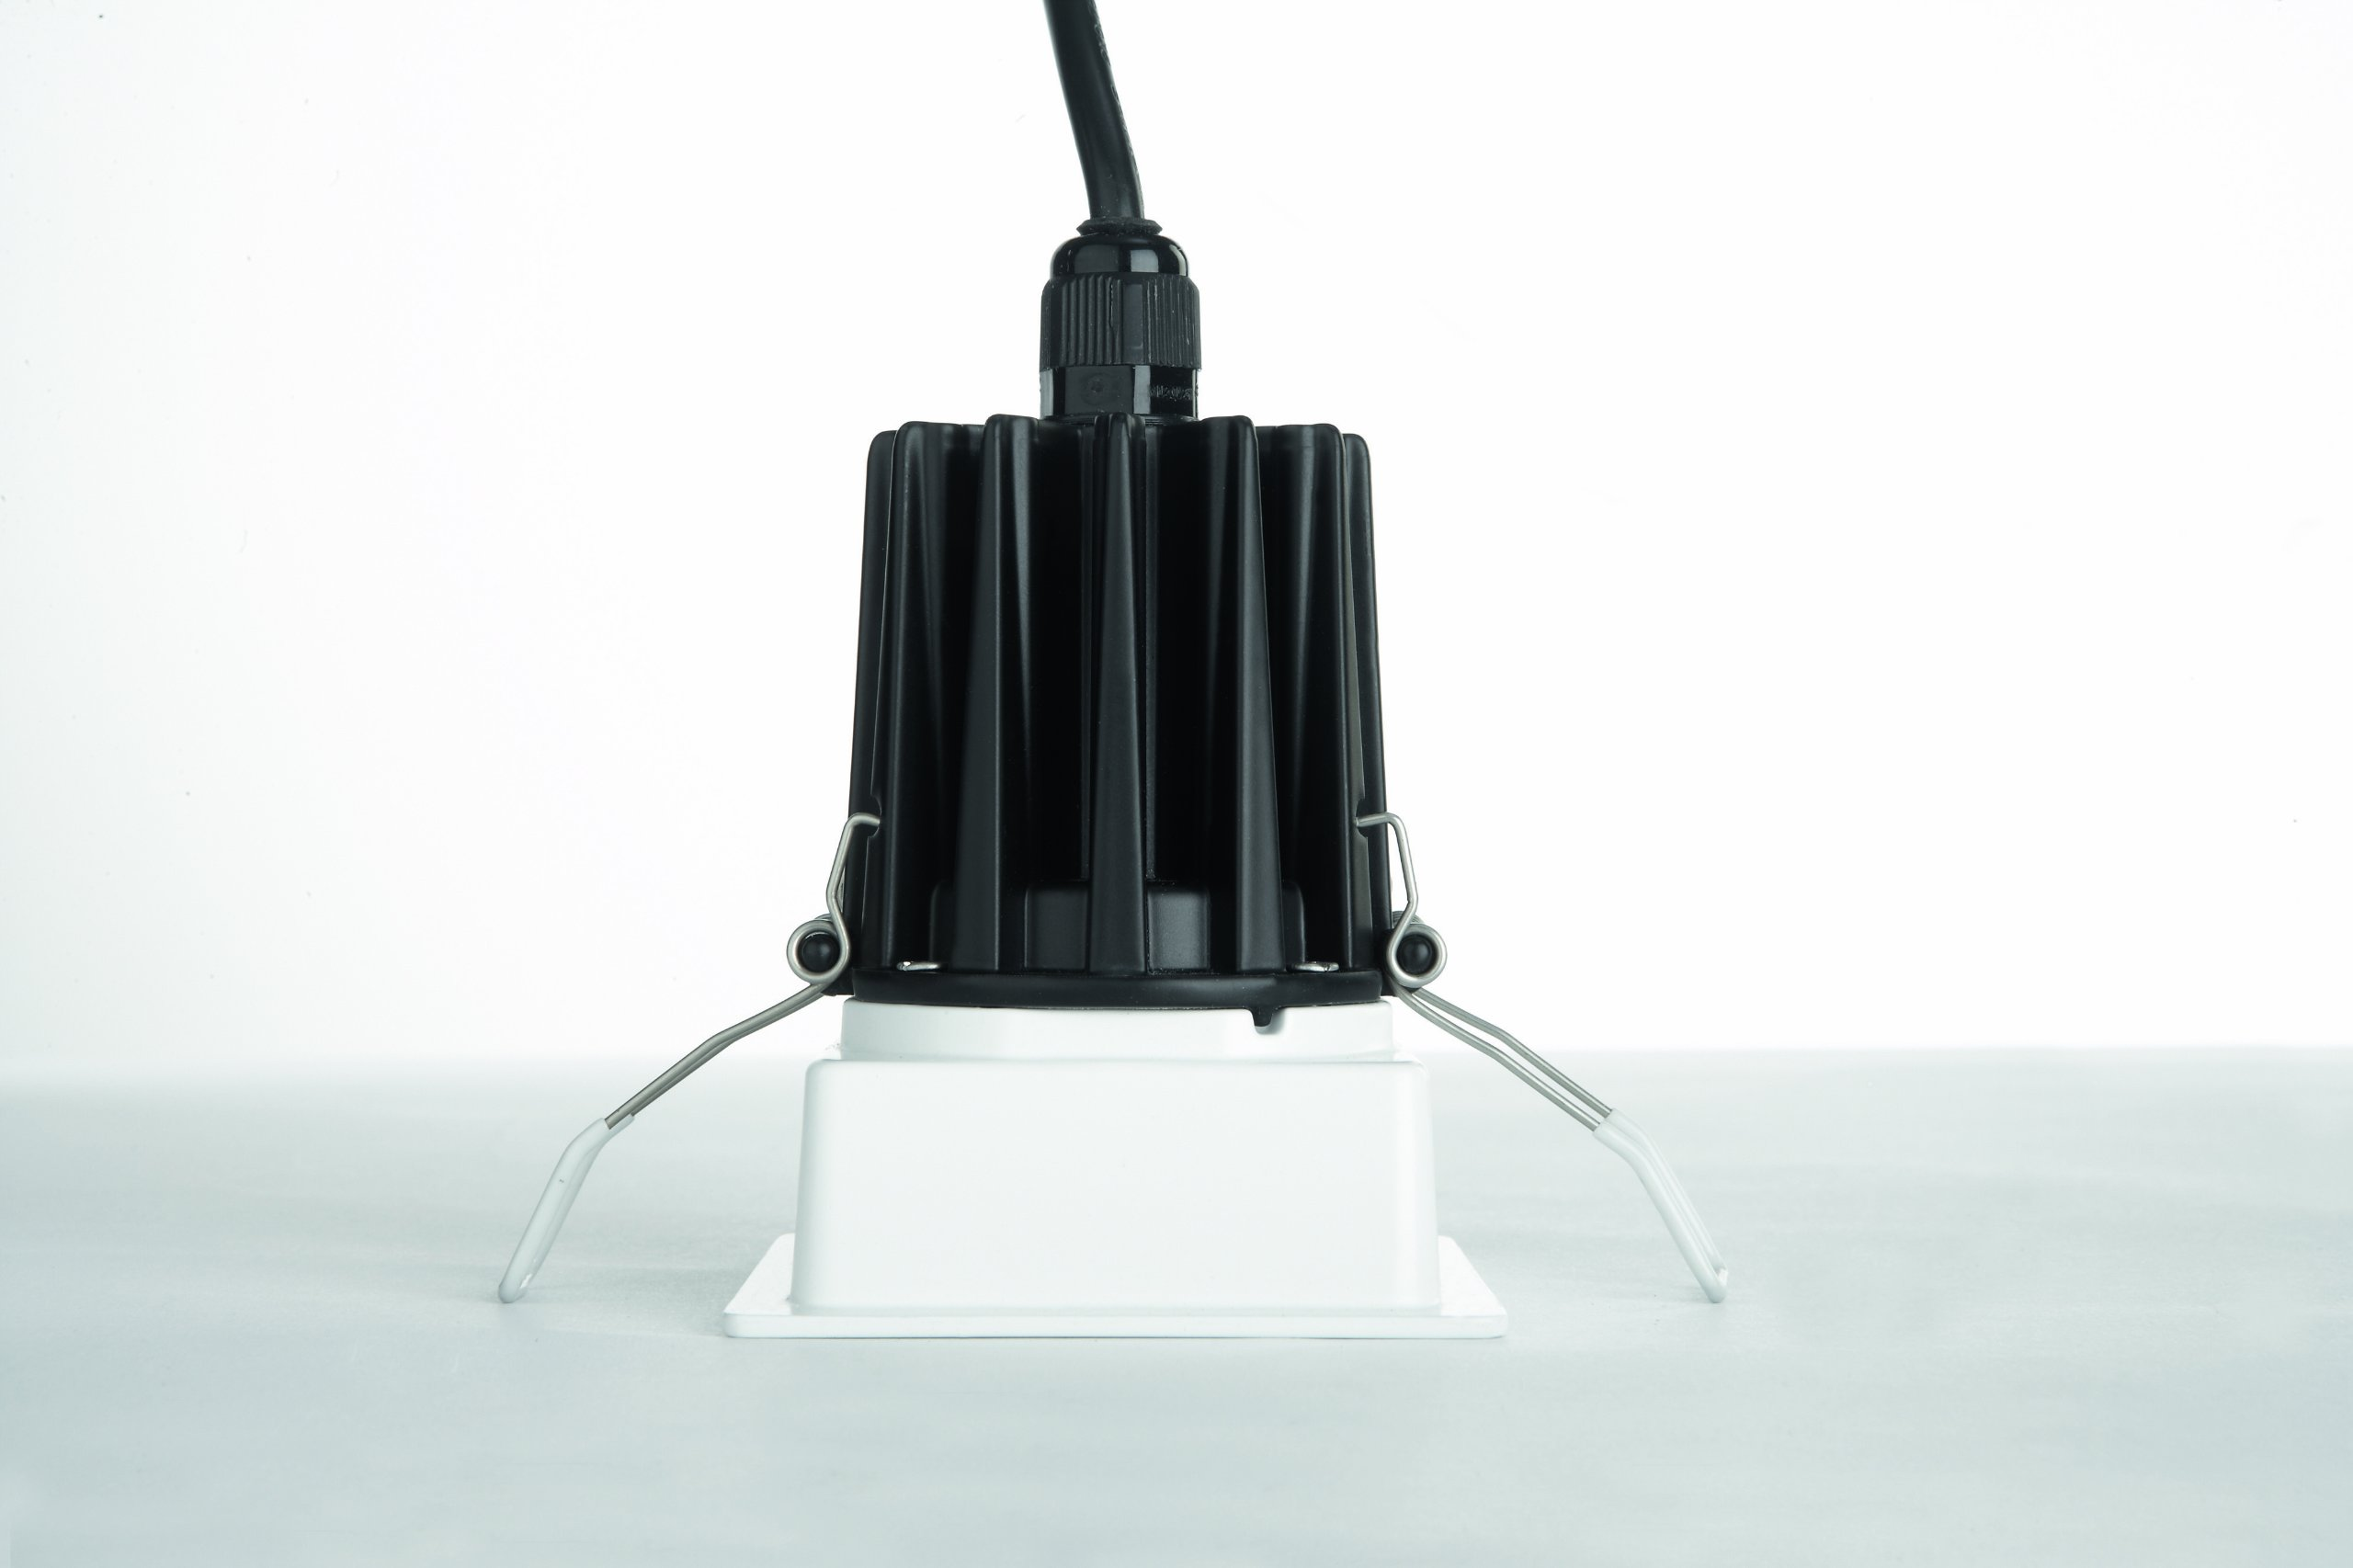 lampadario con faretti : 22 . Lampadario Con Faretti: Philips scope lampadario con faretti led ...